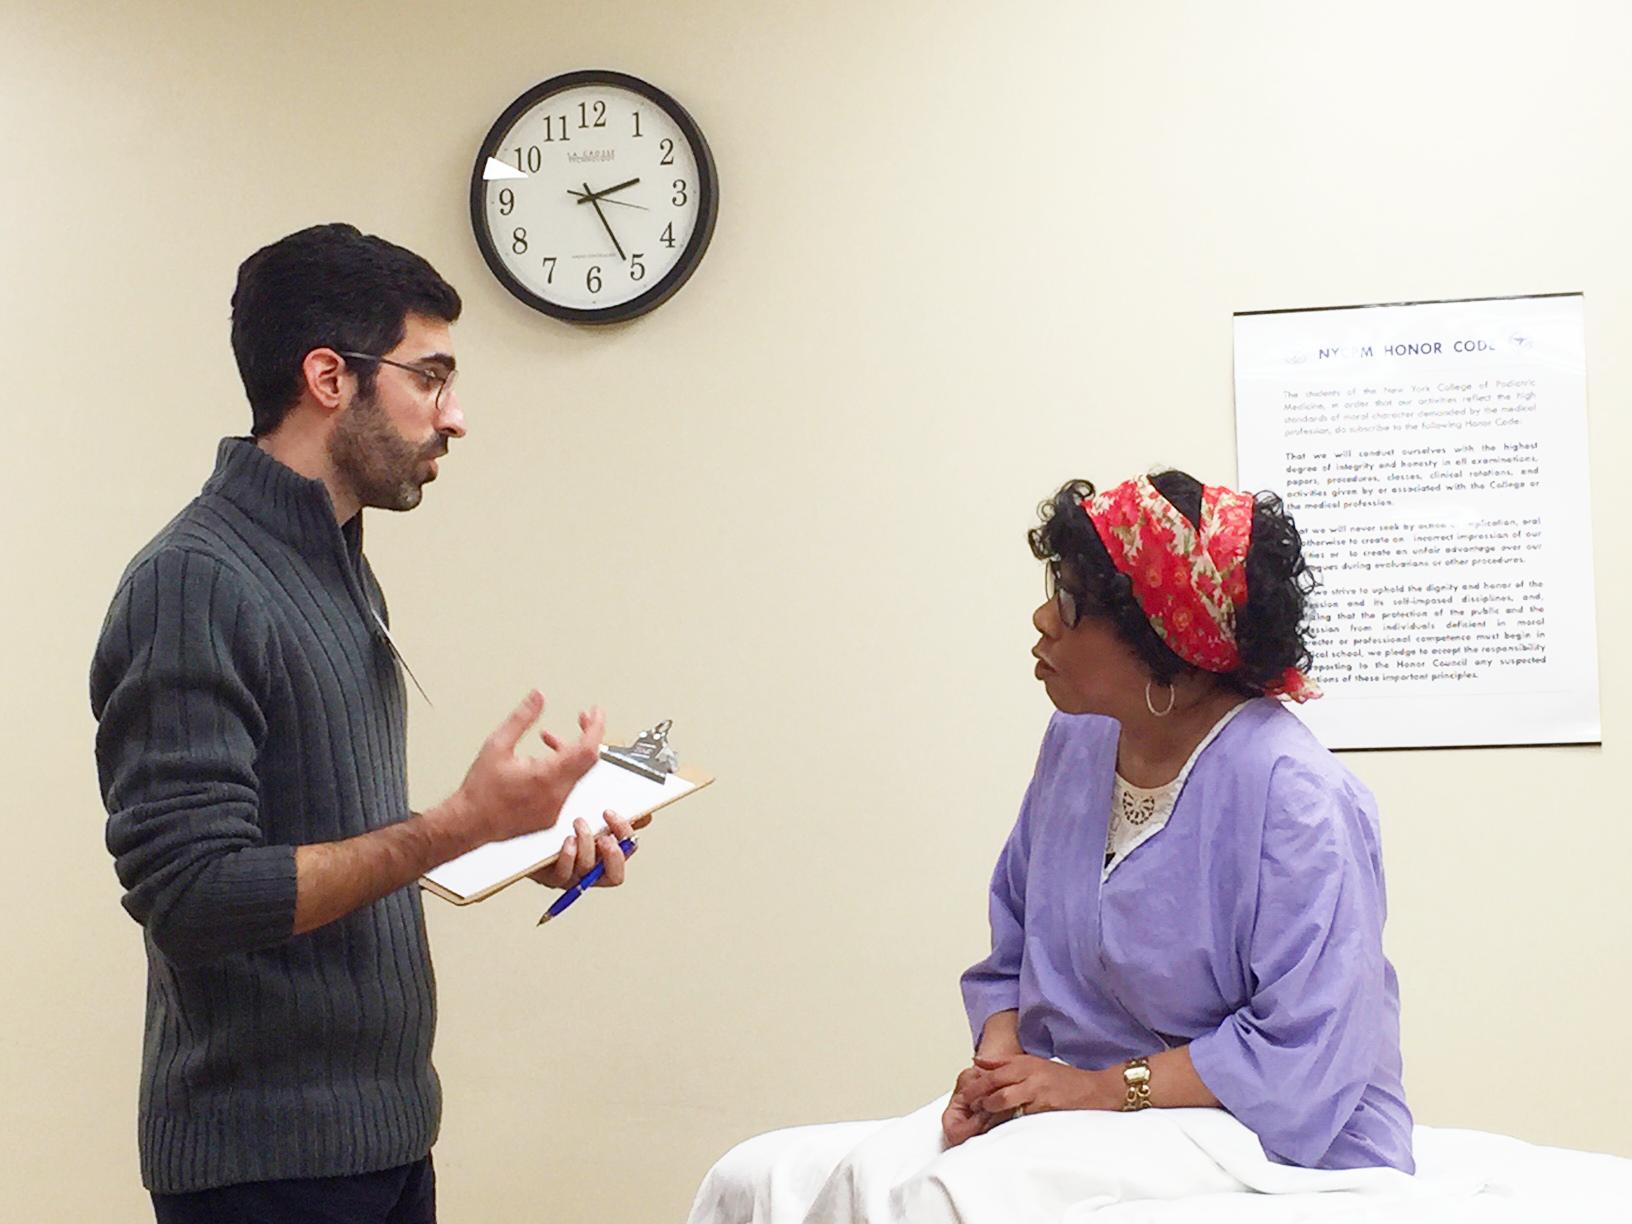 Dr. Mark Swartz, M.D., demonstrates clinical examination techniques using a standardized patient during a Step 2 CS Prep Workshop.